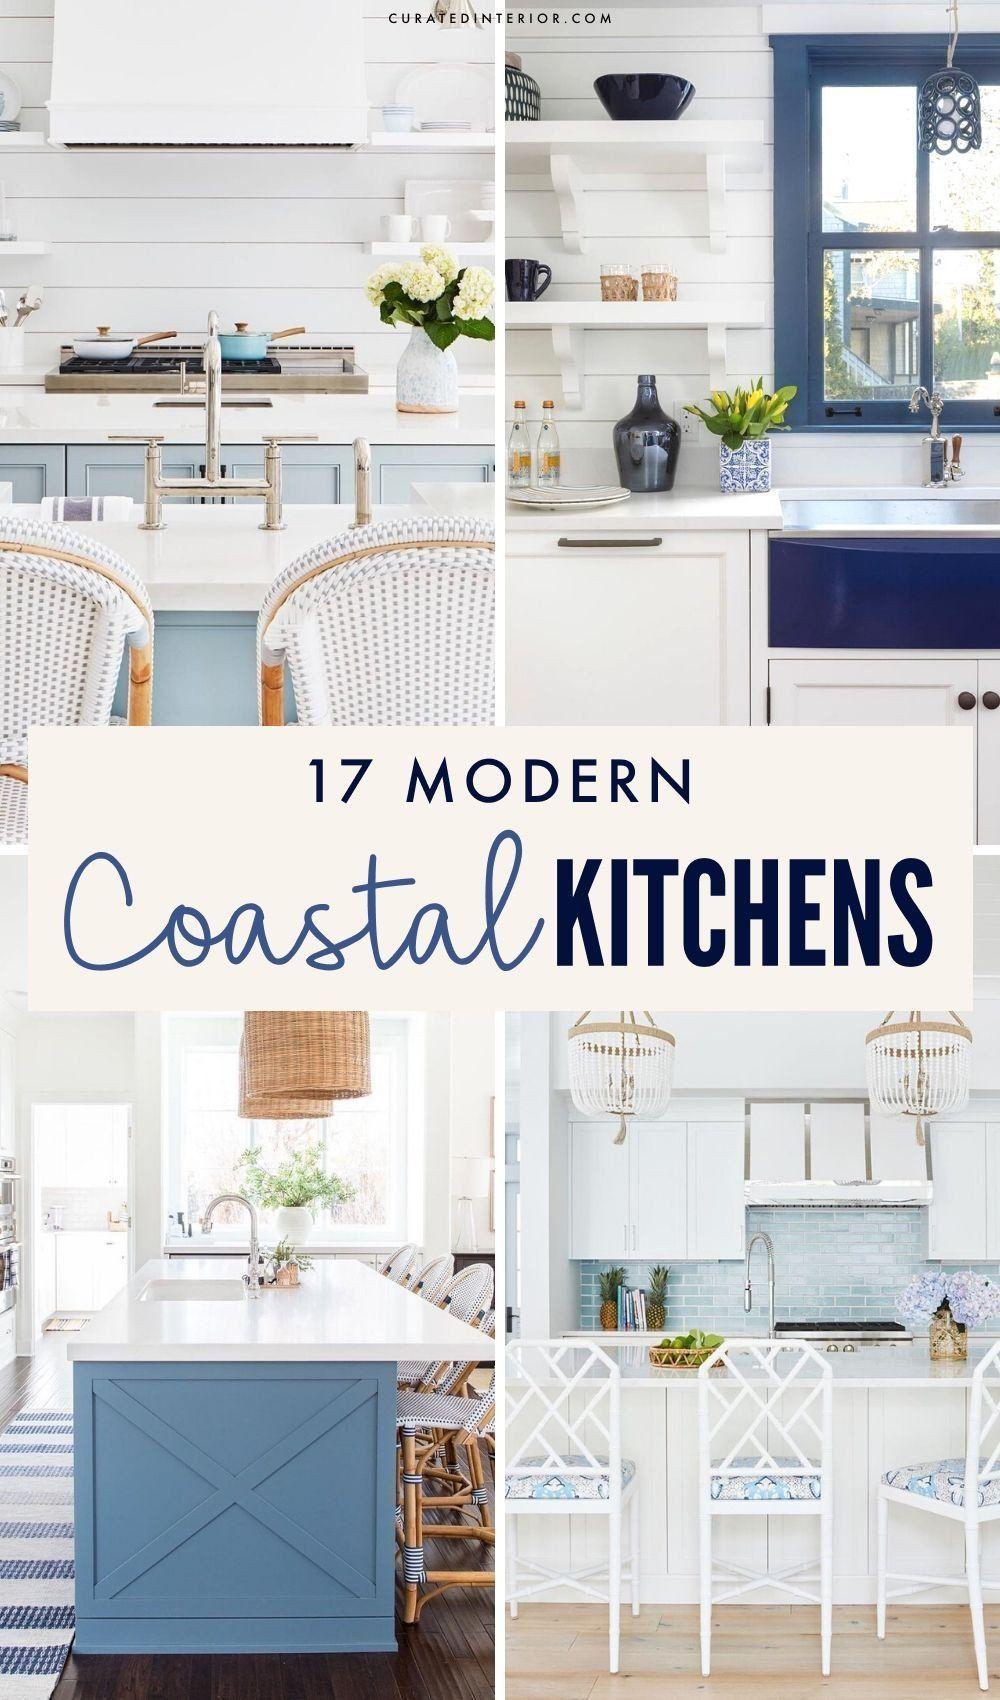 nautical themed kitchen decor pin on kitchen design in 2020 coastal kitchen decor coastal on kitchen decor navy id=65033